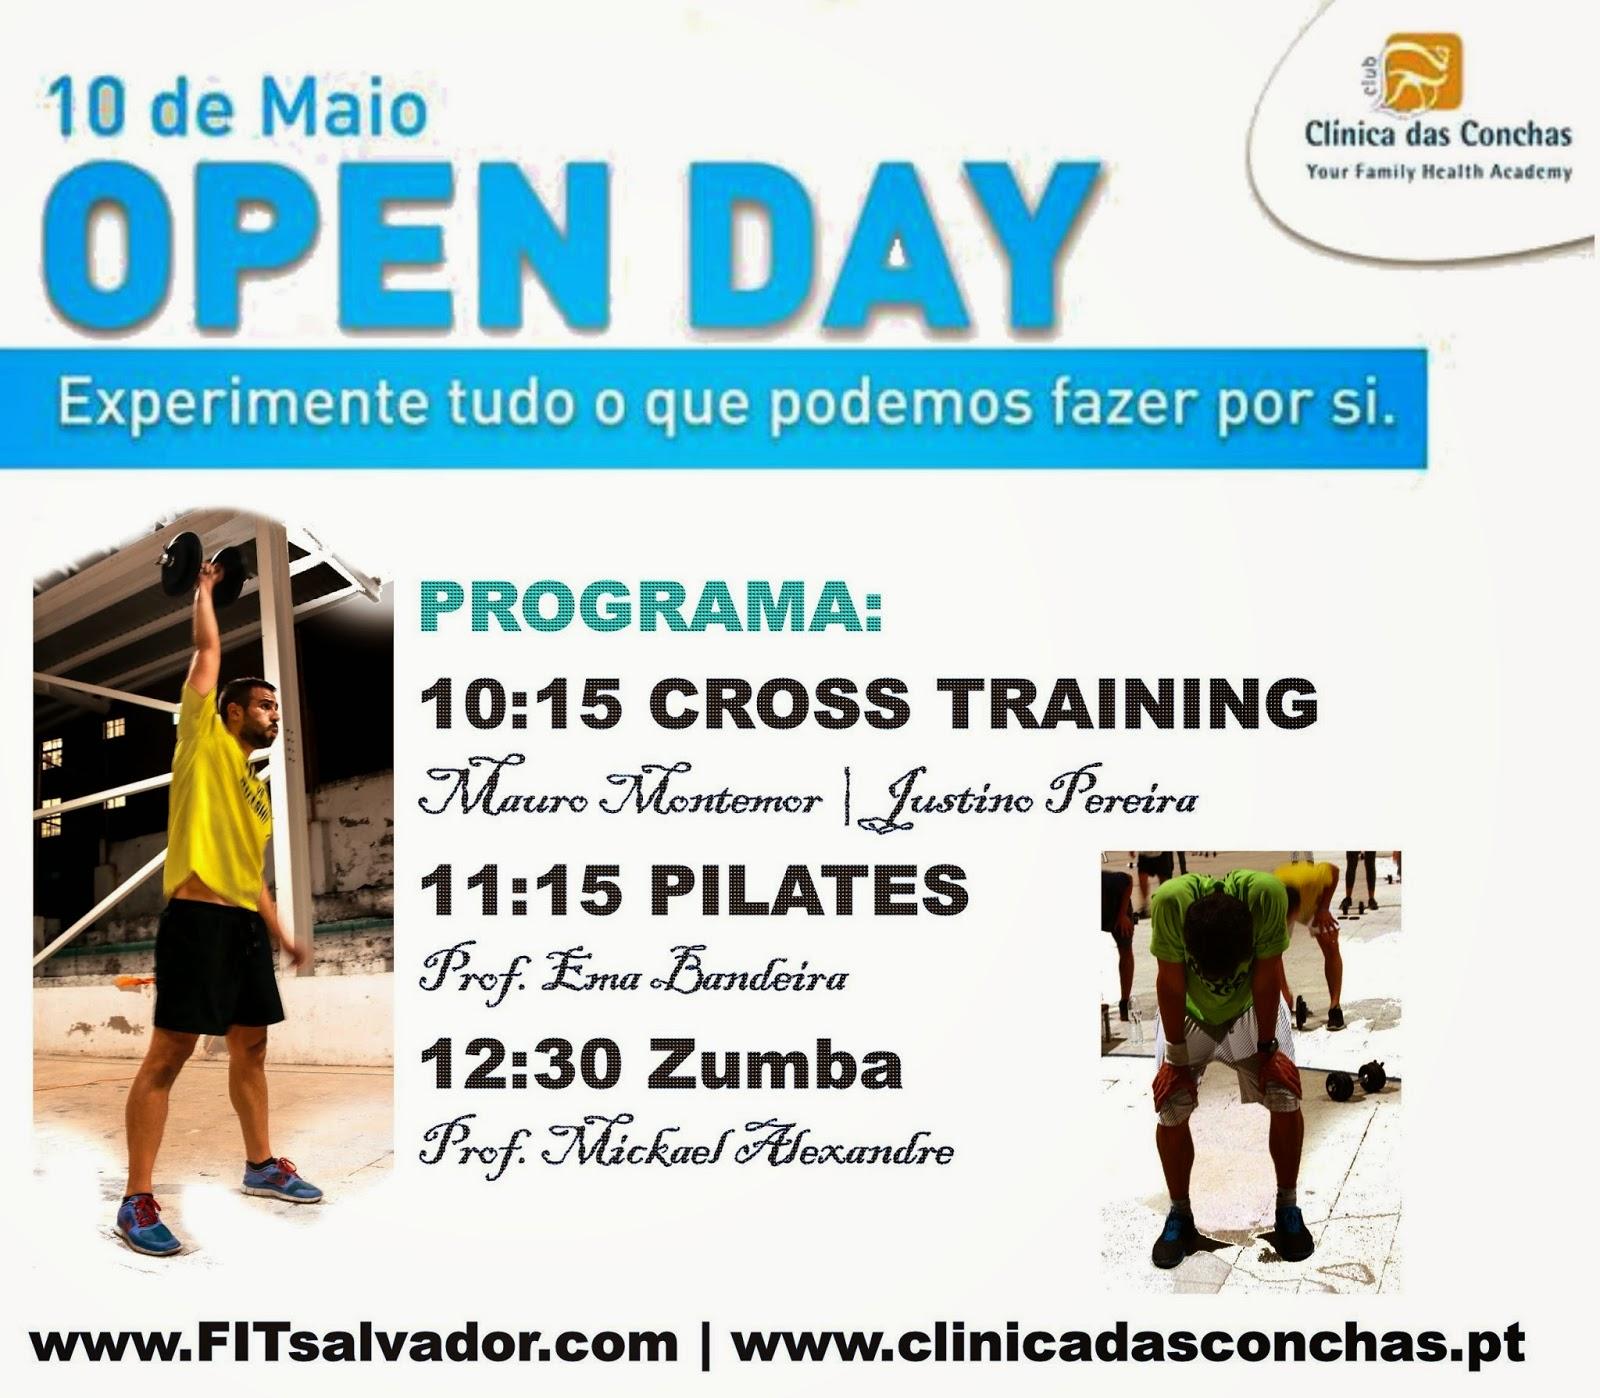 http://www.clinicadasconchas.pt/